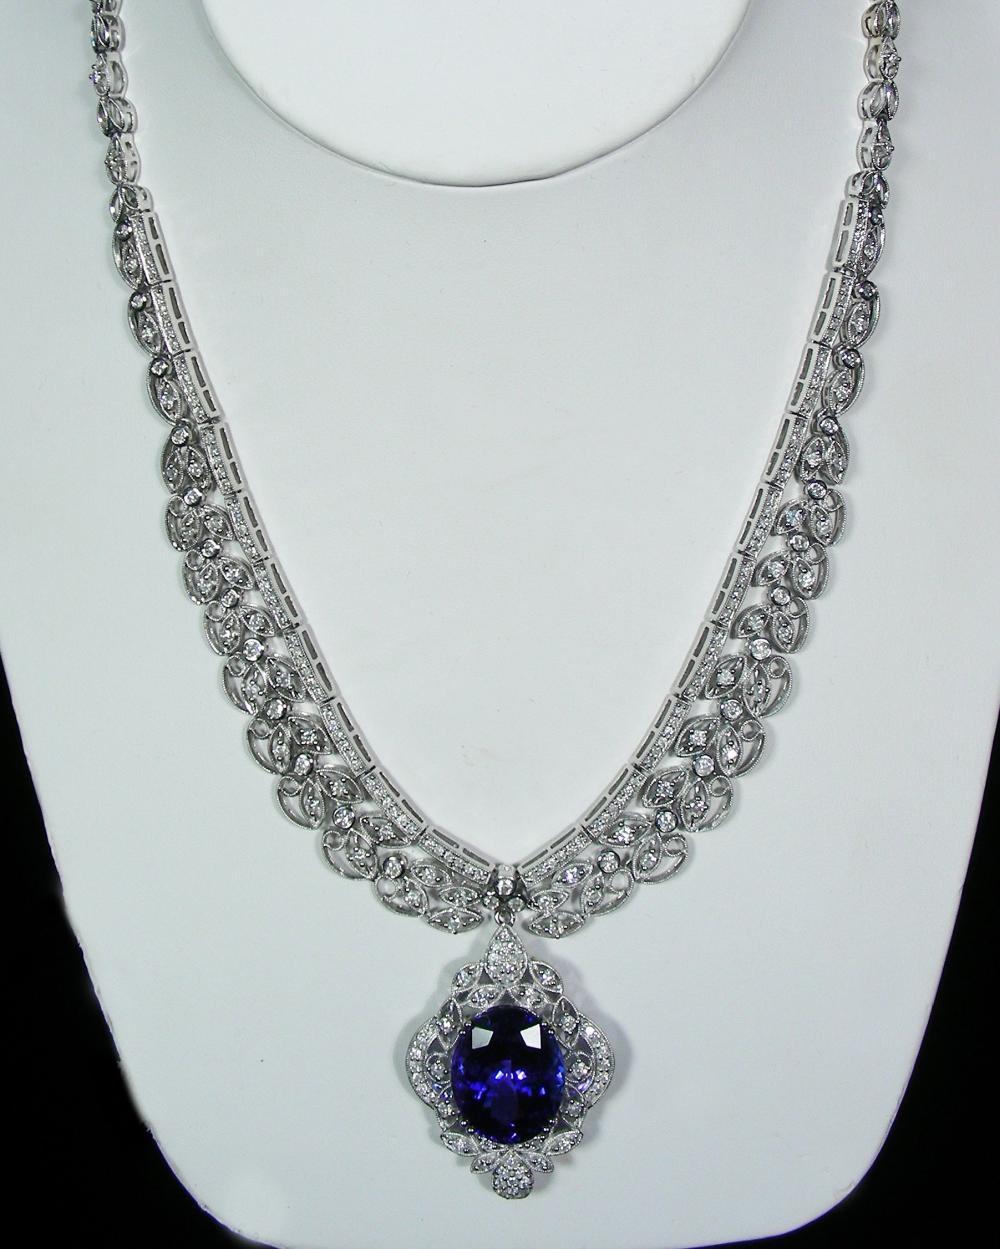 LADIES 18K WHITE GOLD, TANZANITE & DIAMOND NECKLACE